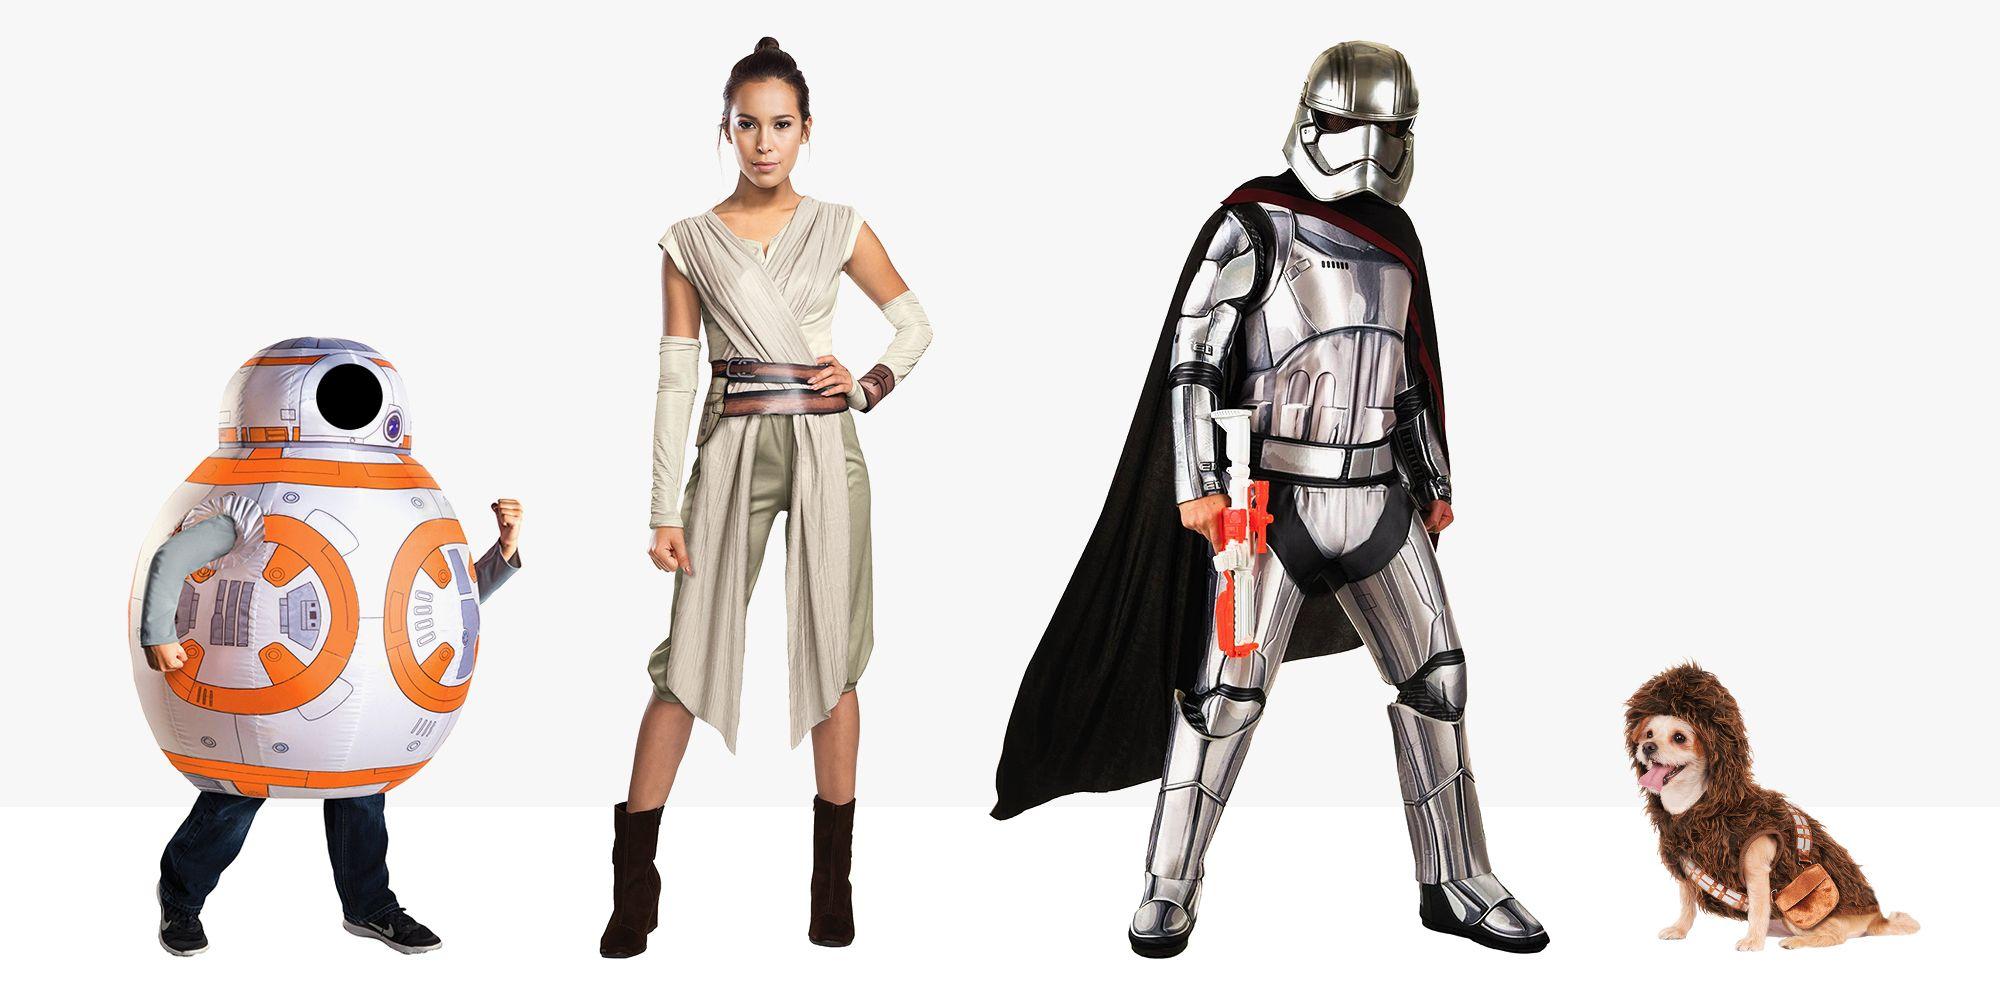 15 Best Star Wars Costumes for Halloween 2018 - Star Wars Costume ...